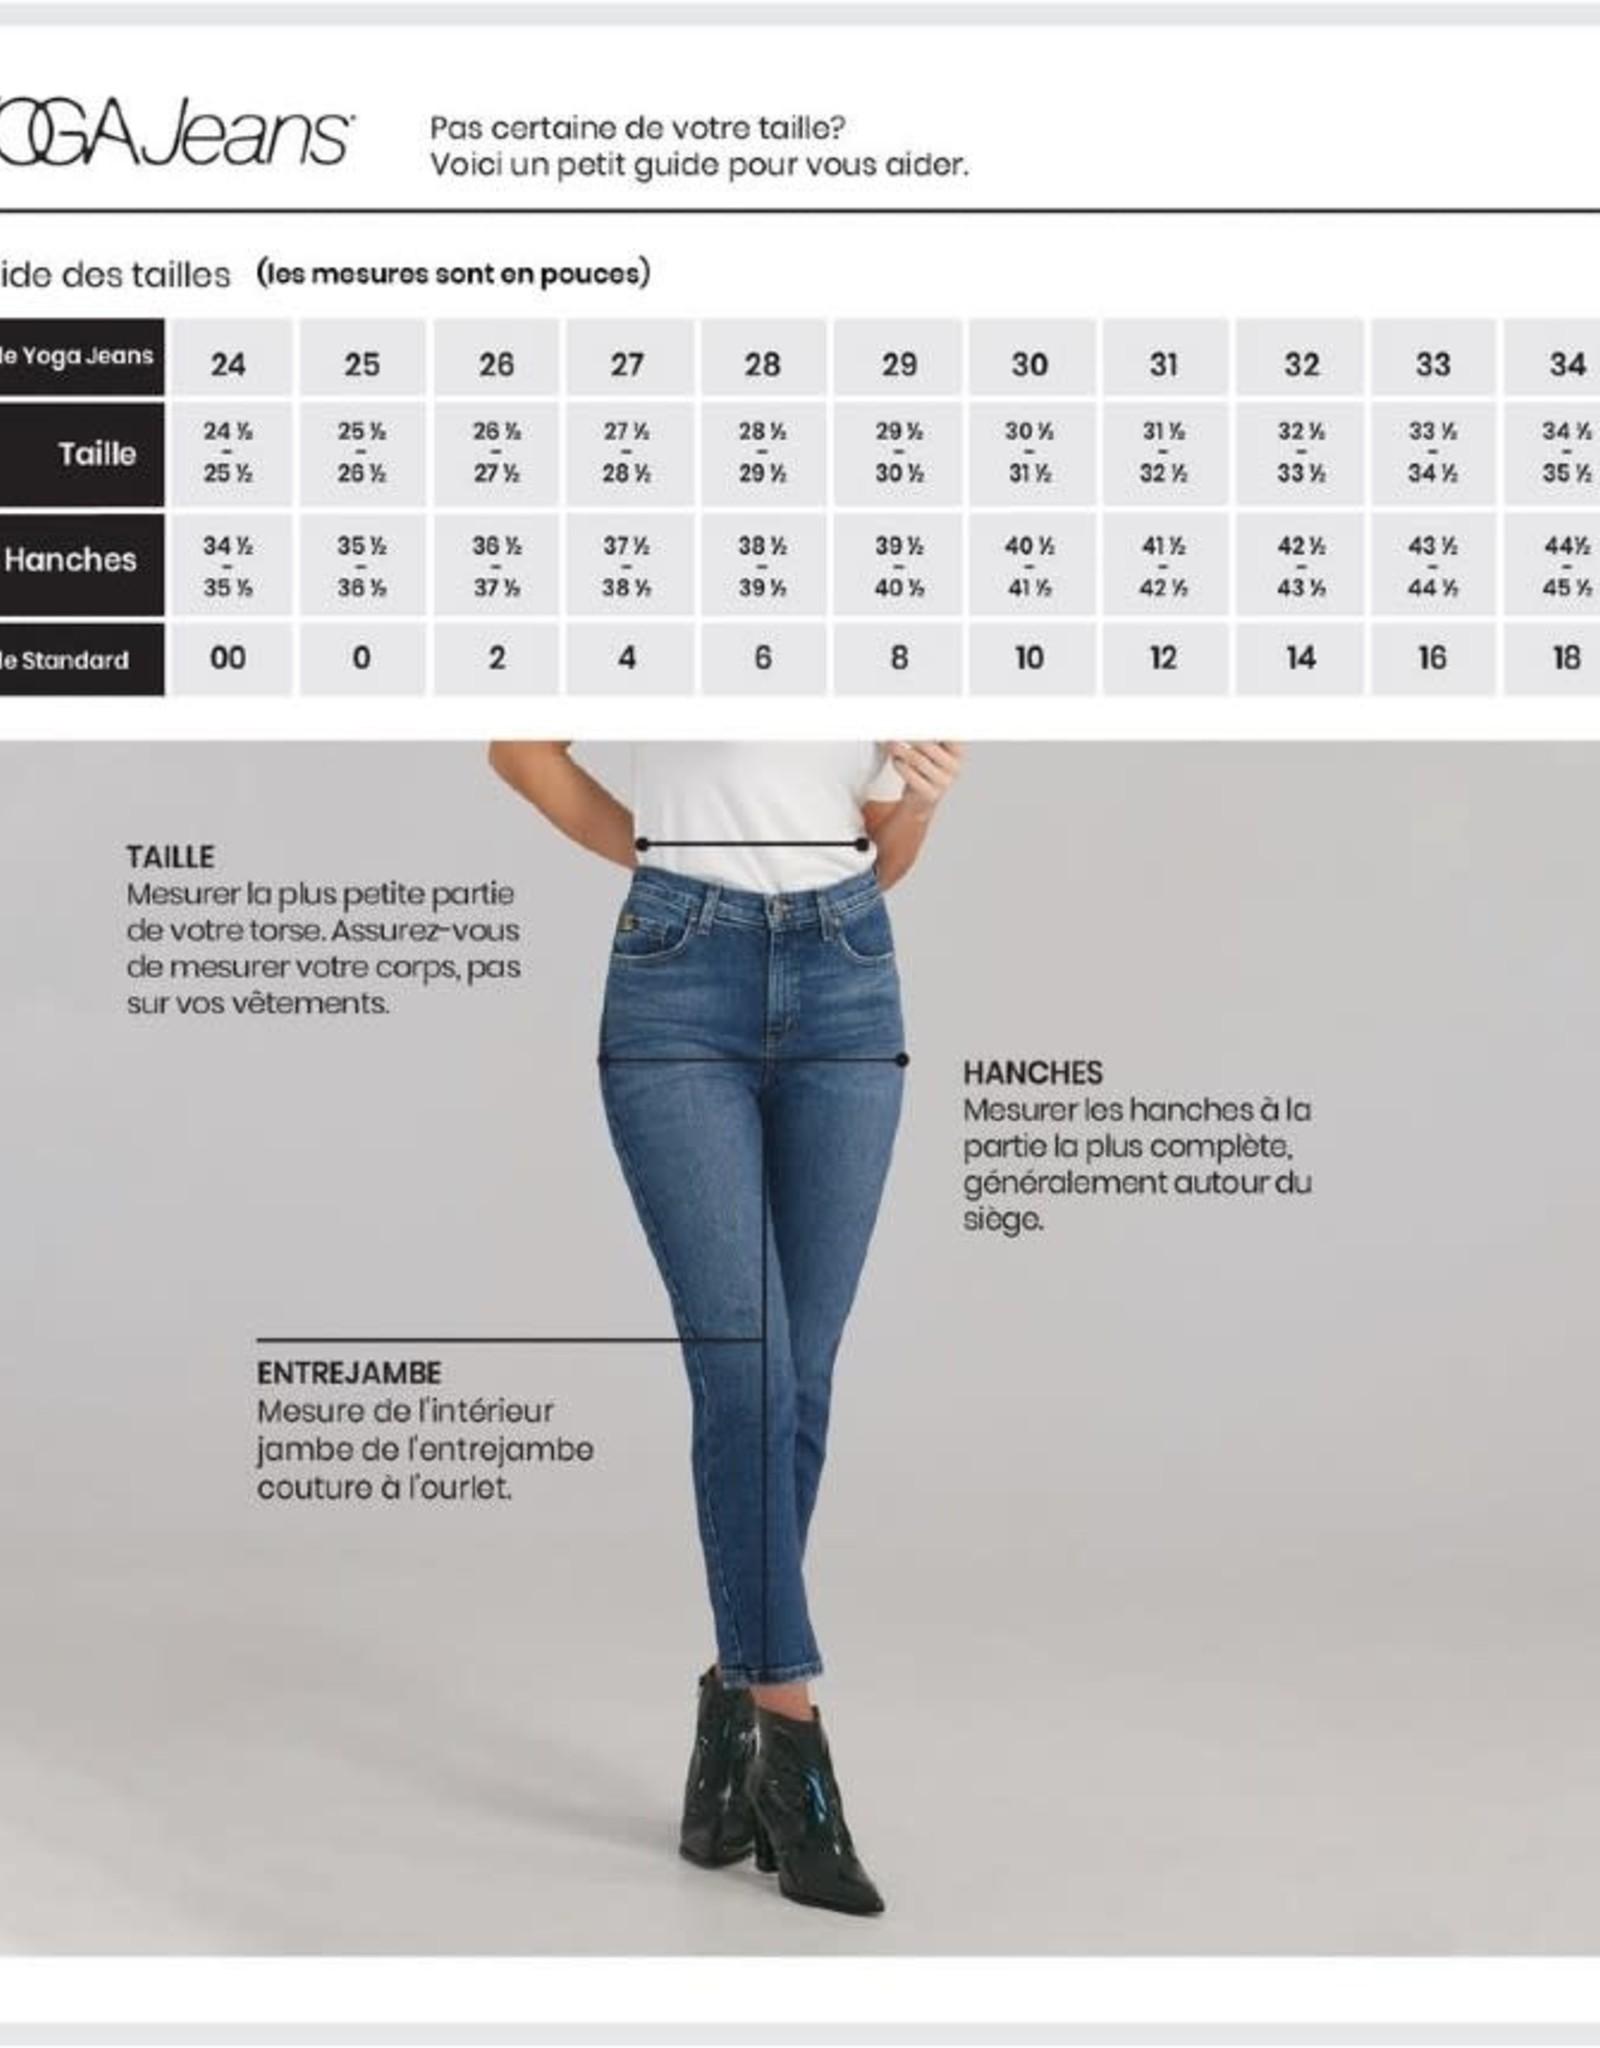 Yoga Jeans Classic Rise Skinny 1711 AH1920 Yoga Jeans